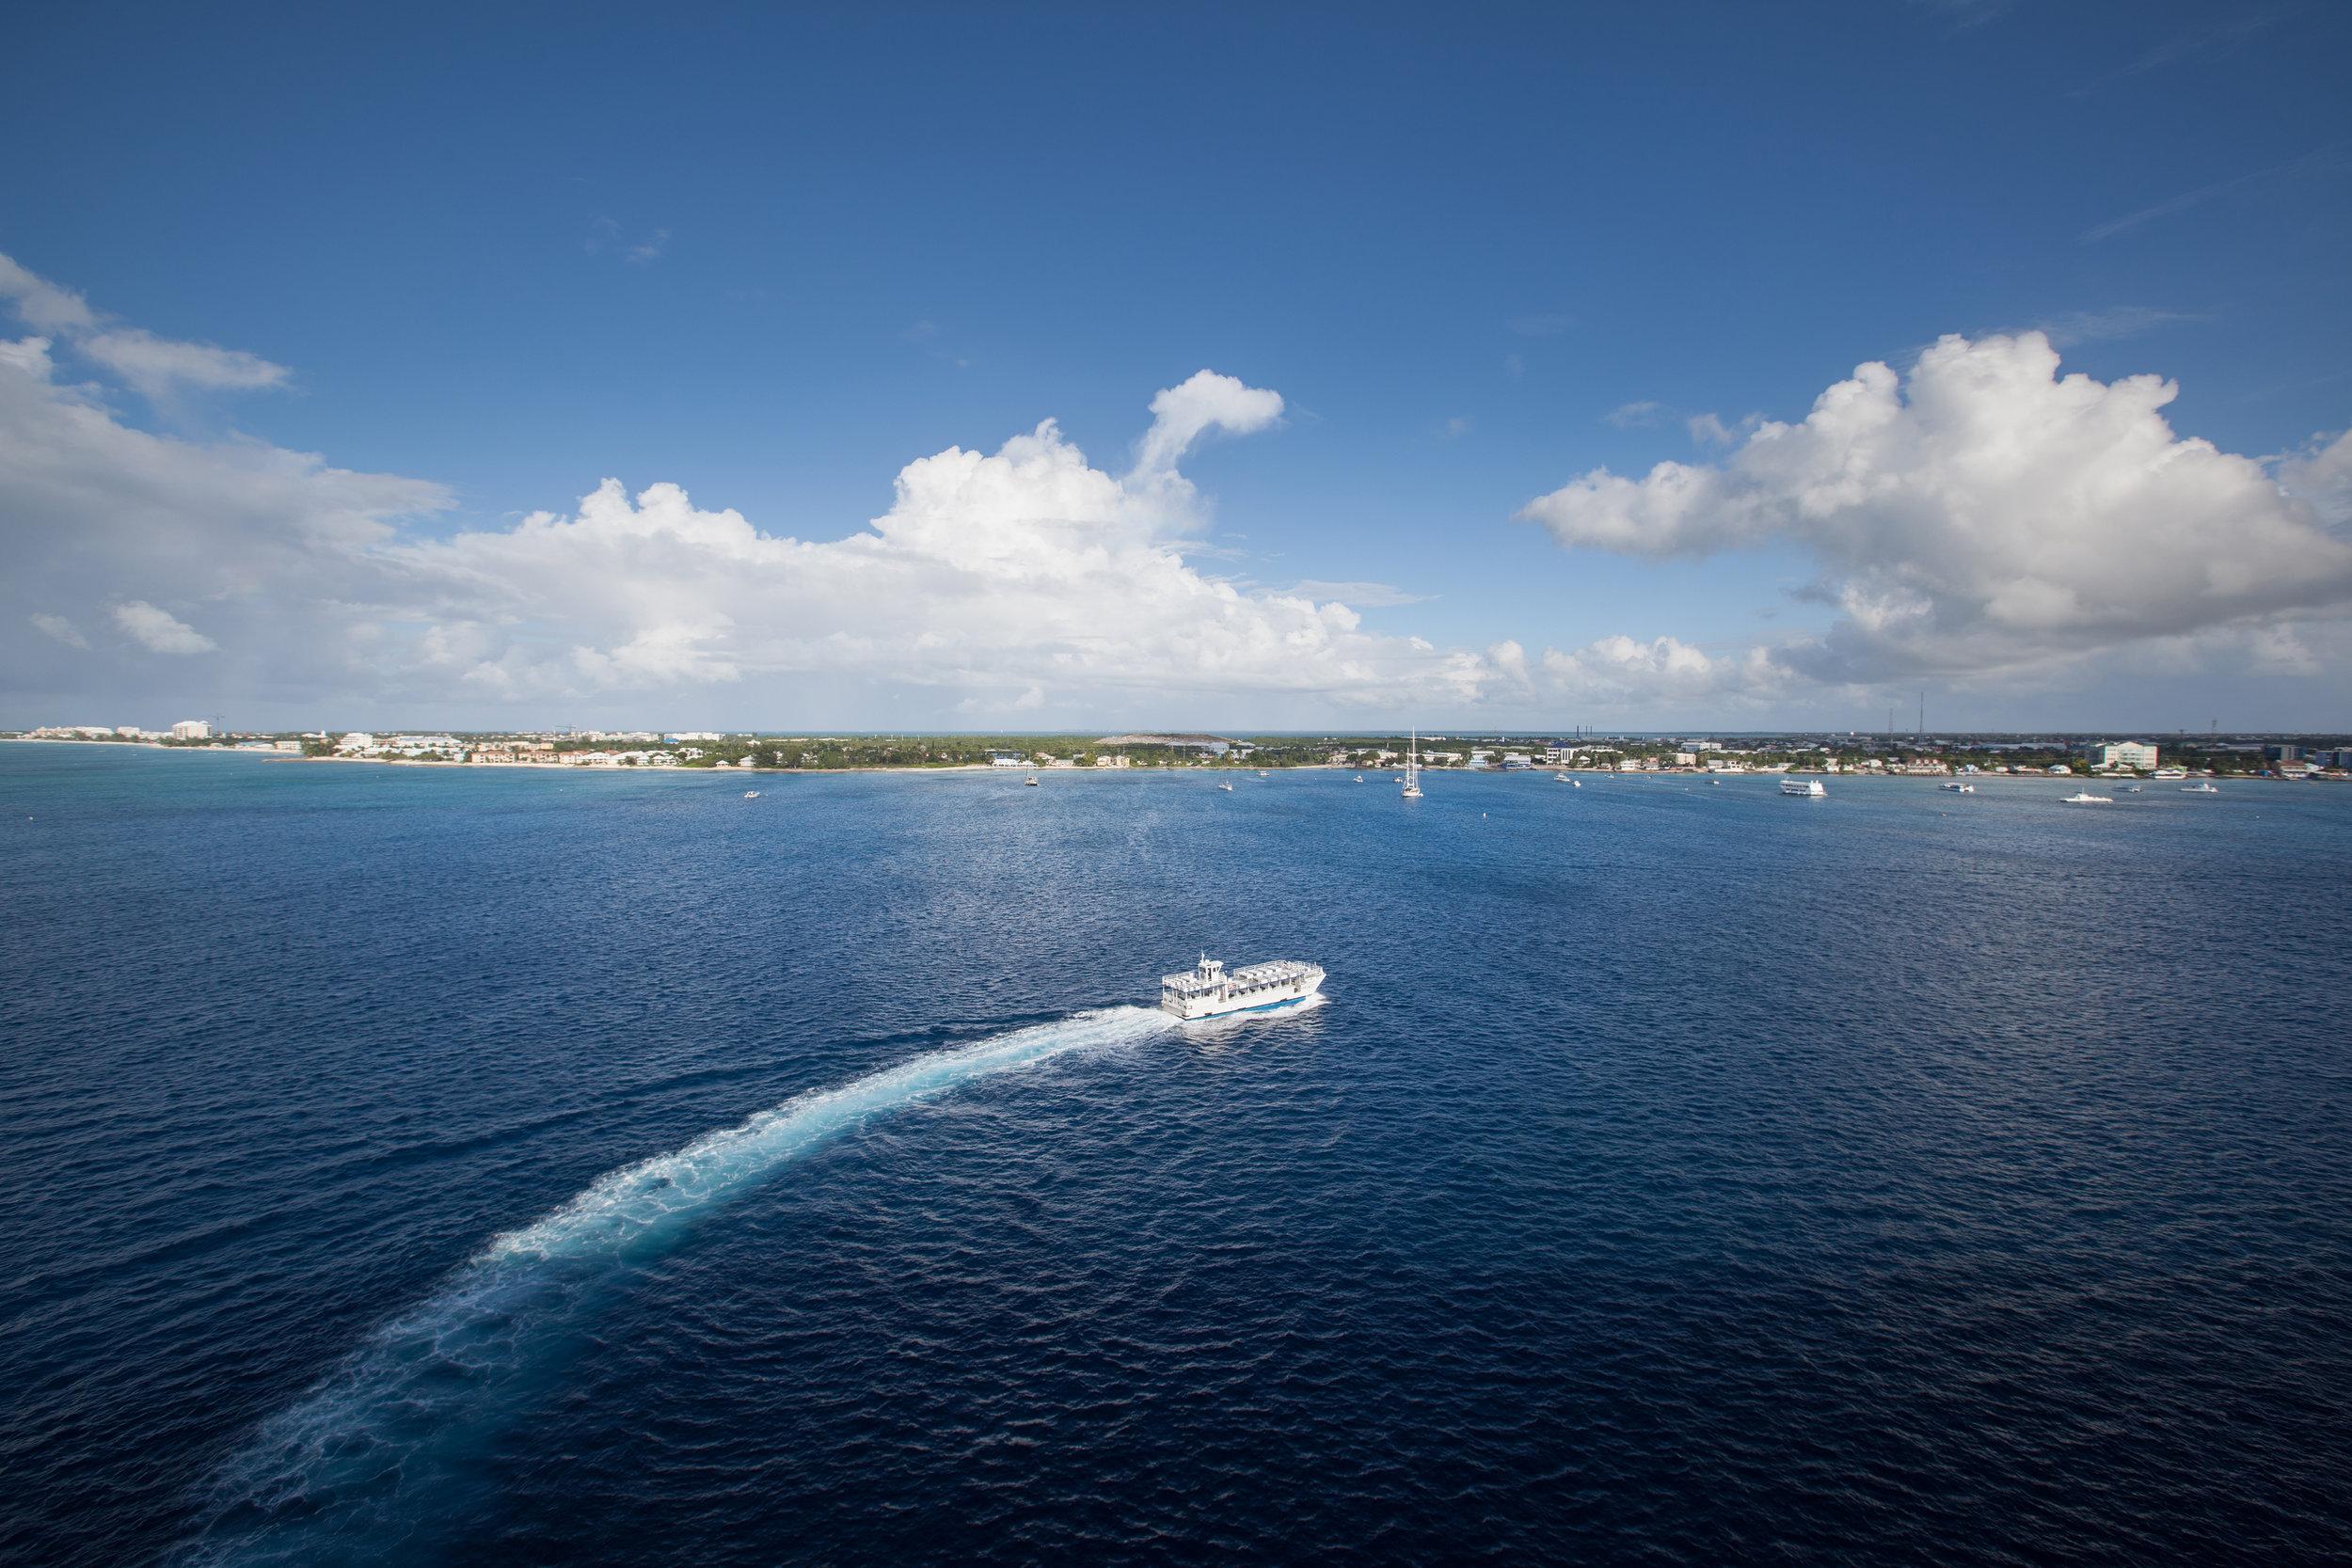 boat_ocean_rustywilliams.jpg